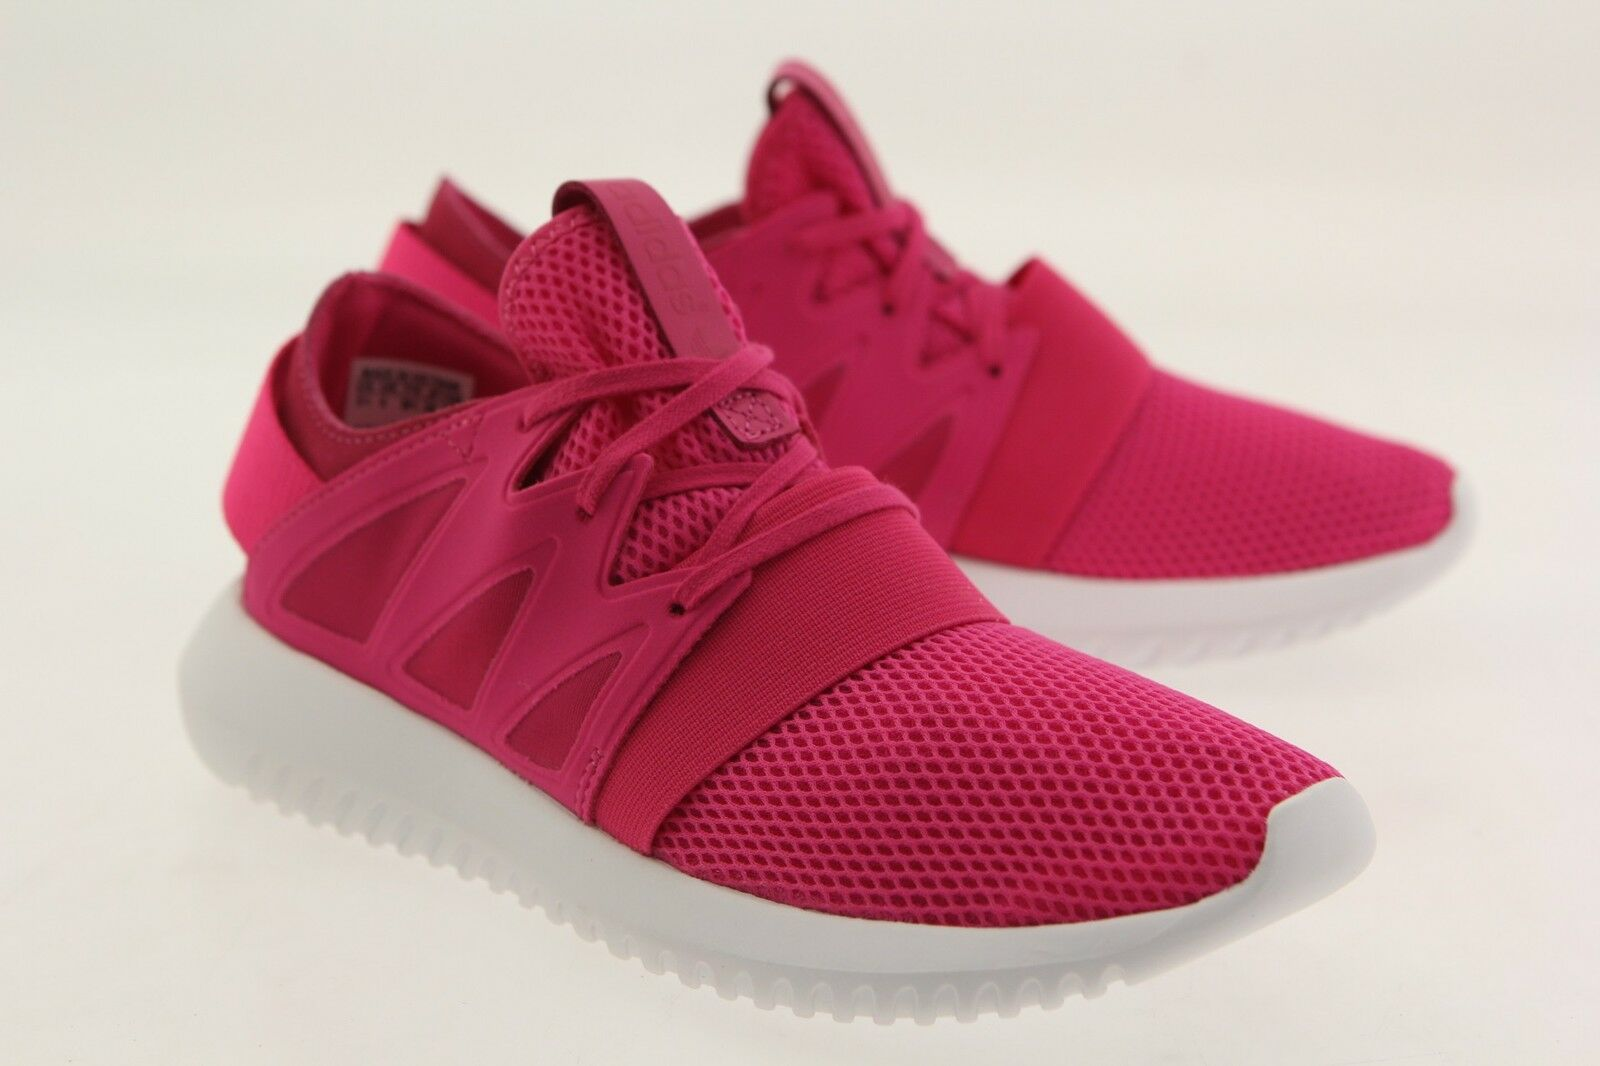 Adidas Damens Tubular Viral pink eqt pink shock pink AQ6302